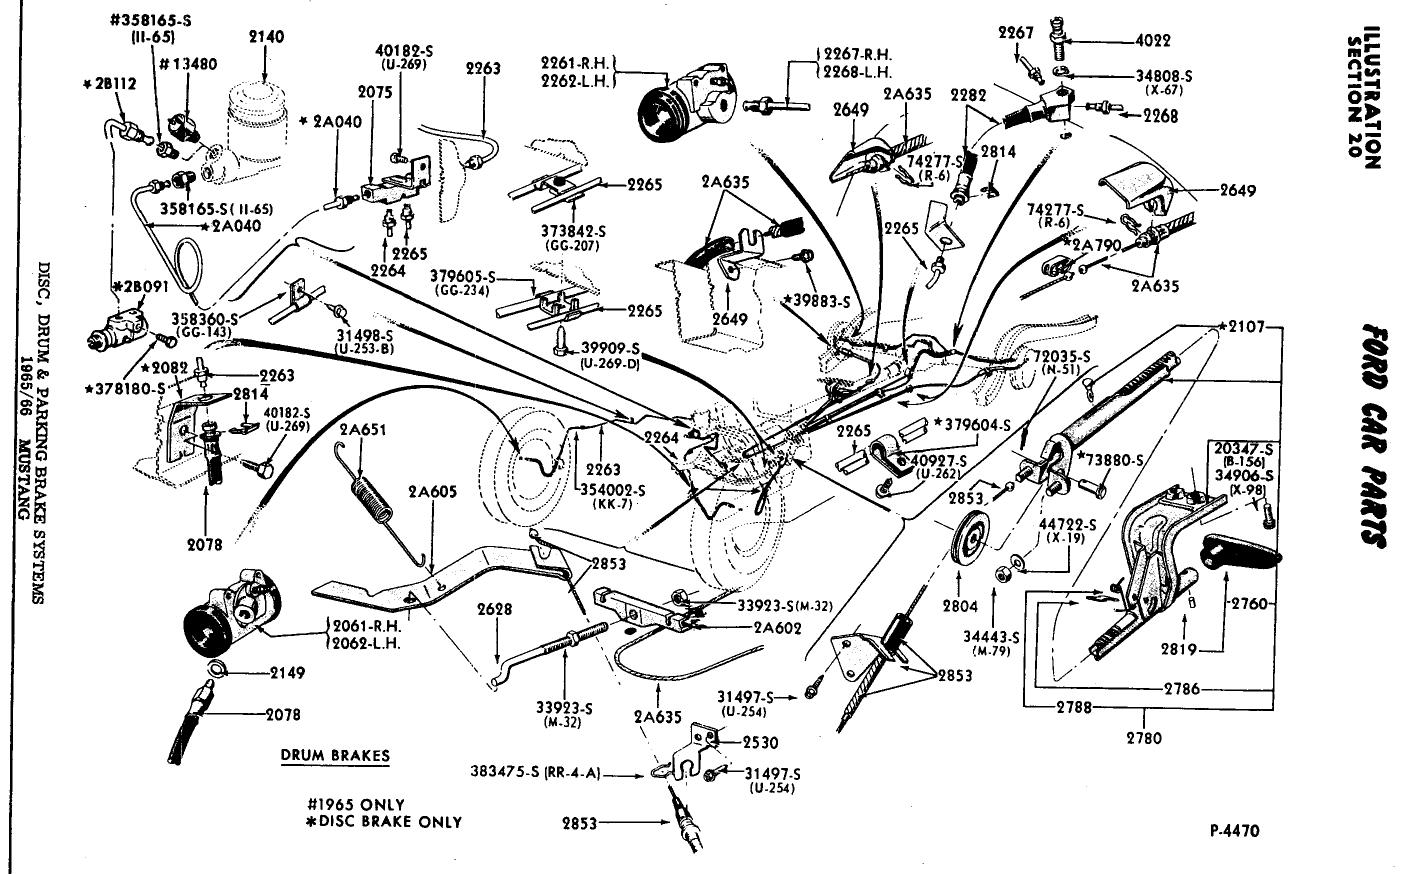 1965 Ford Fairlane Brake Diagram Data Wiring Diagrams 1969 Galaxie Example Electrical U2022 Rh Huntervalleyhotels Co